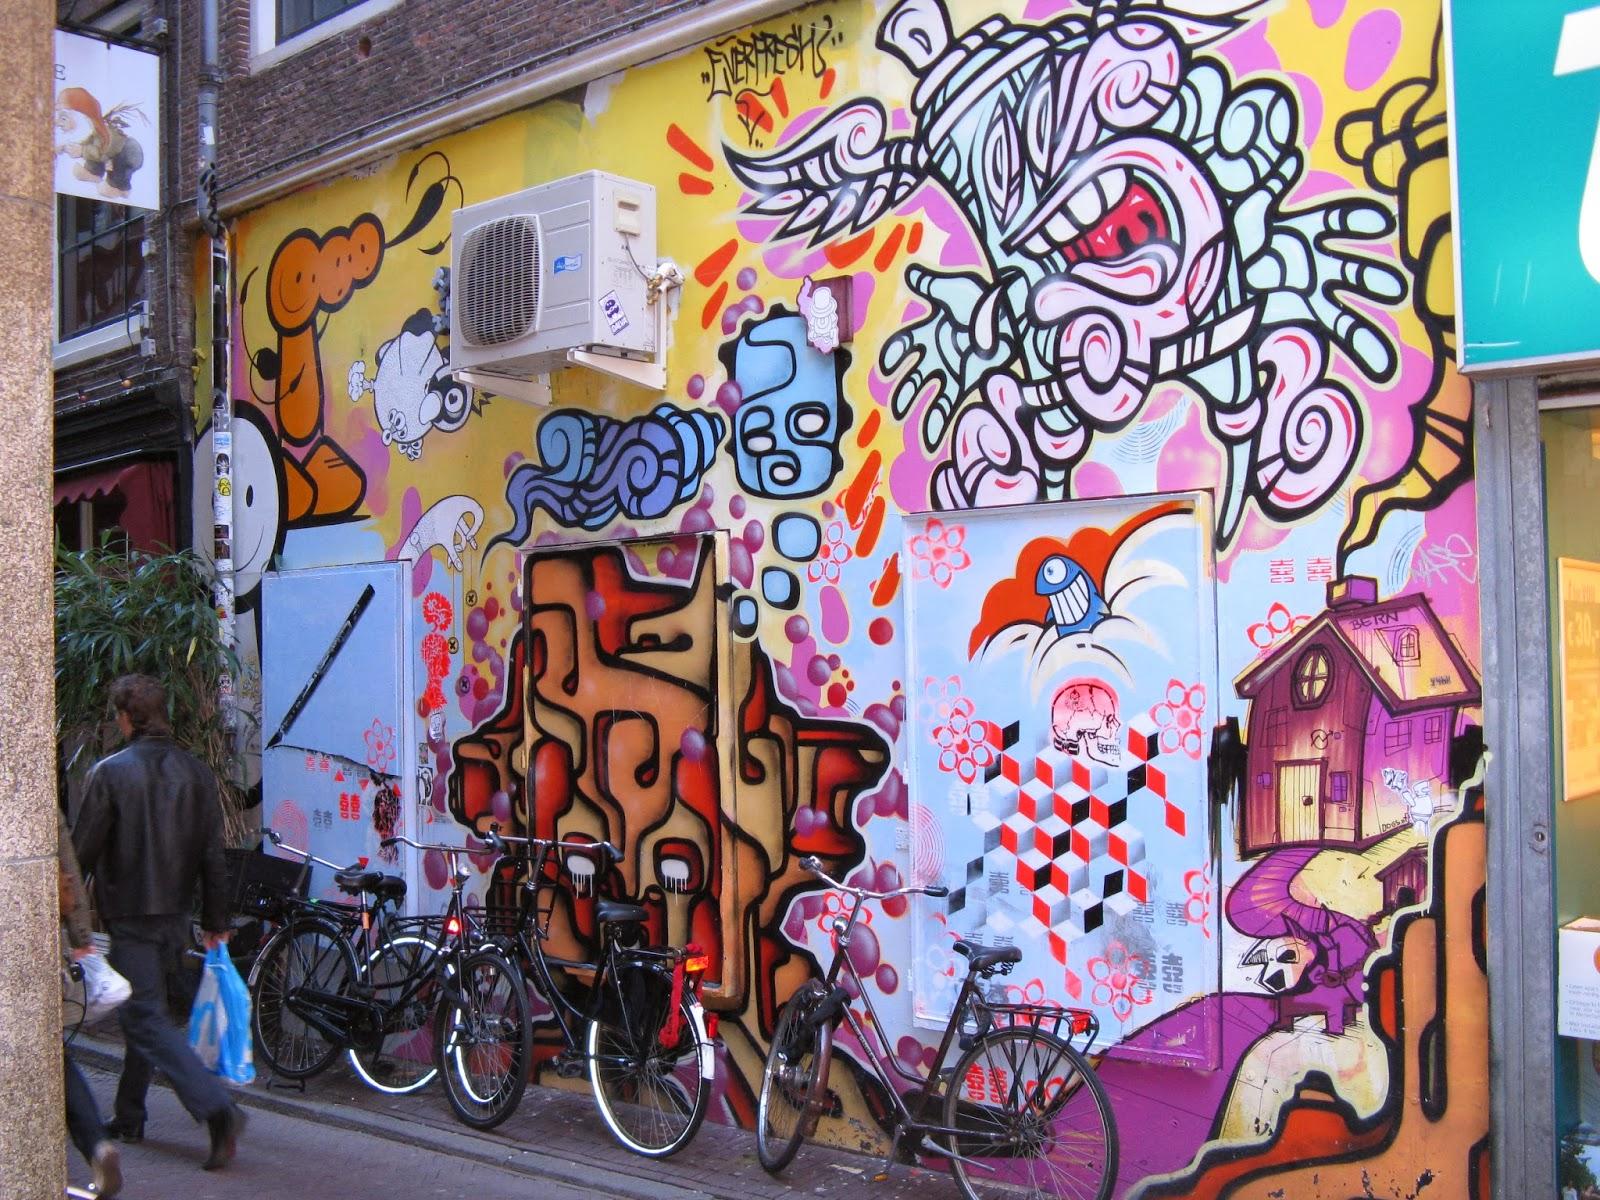 Graffiti art or vandalism learnenglish teens british free essay